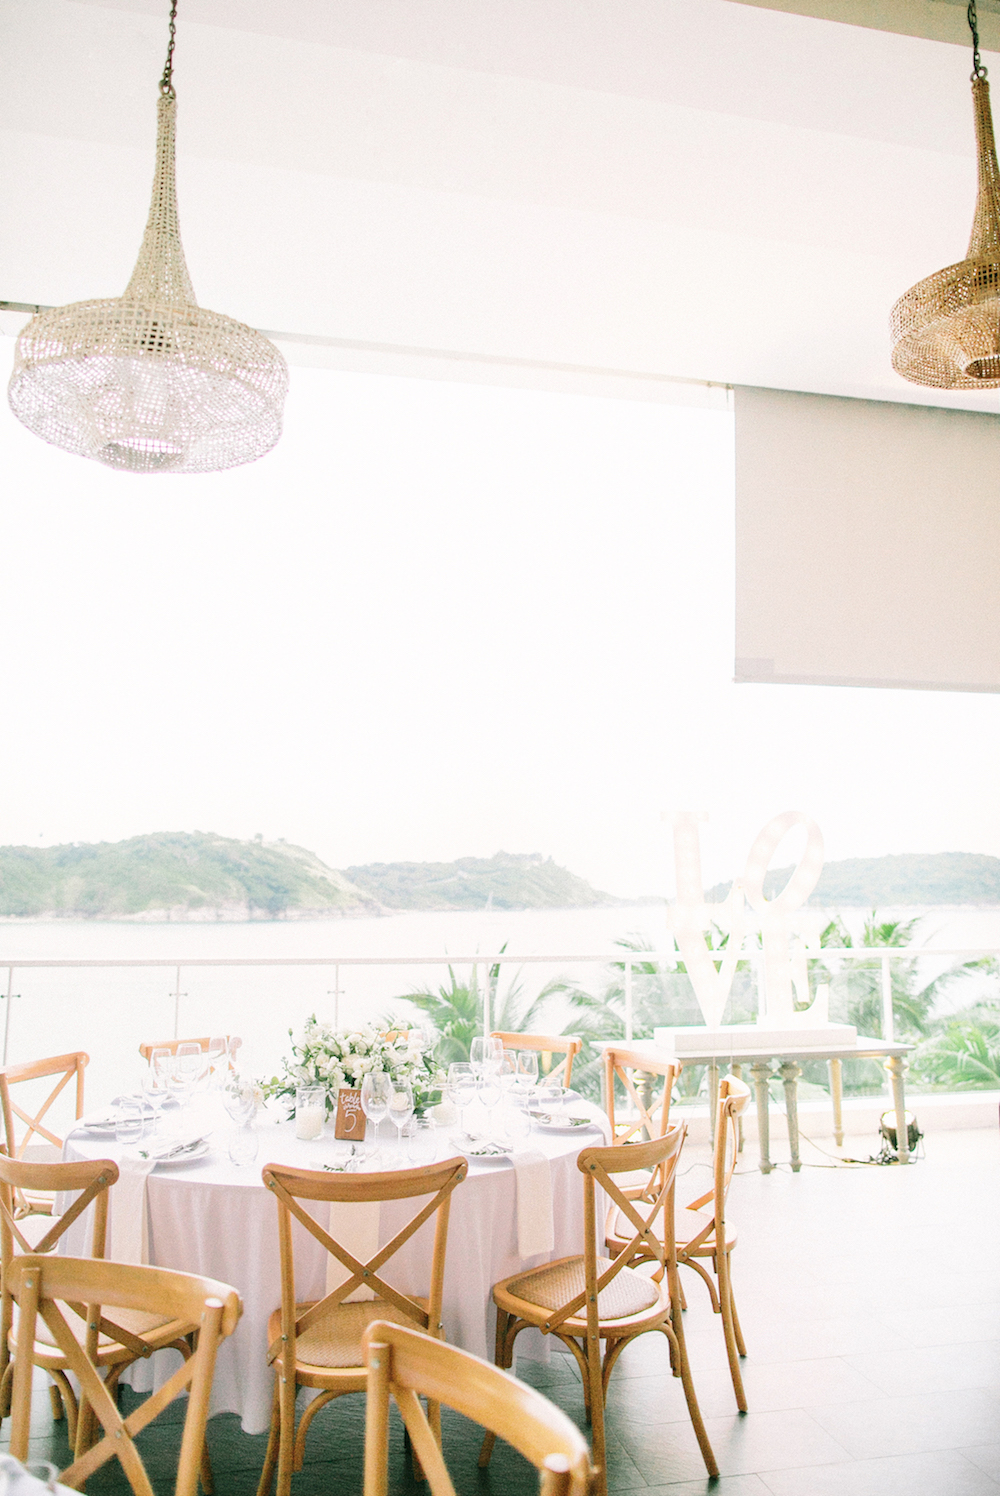 ©-saya-photography-studio-ohlala-wedding-photographer-photographe-mariage-the-naiharn-phuket-213.jpg